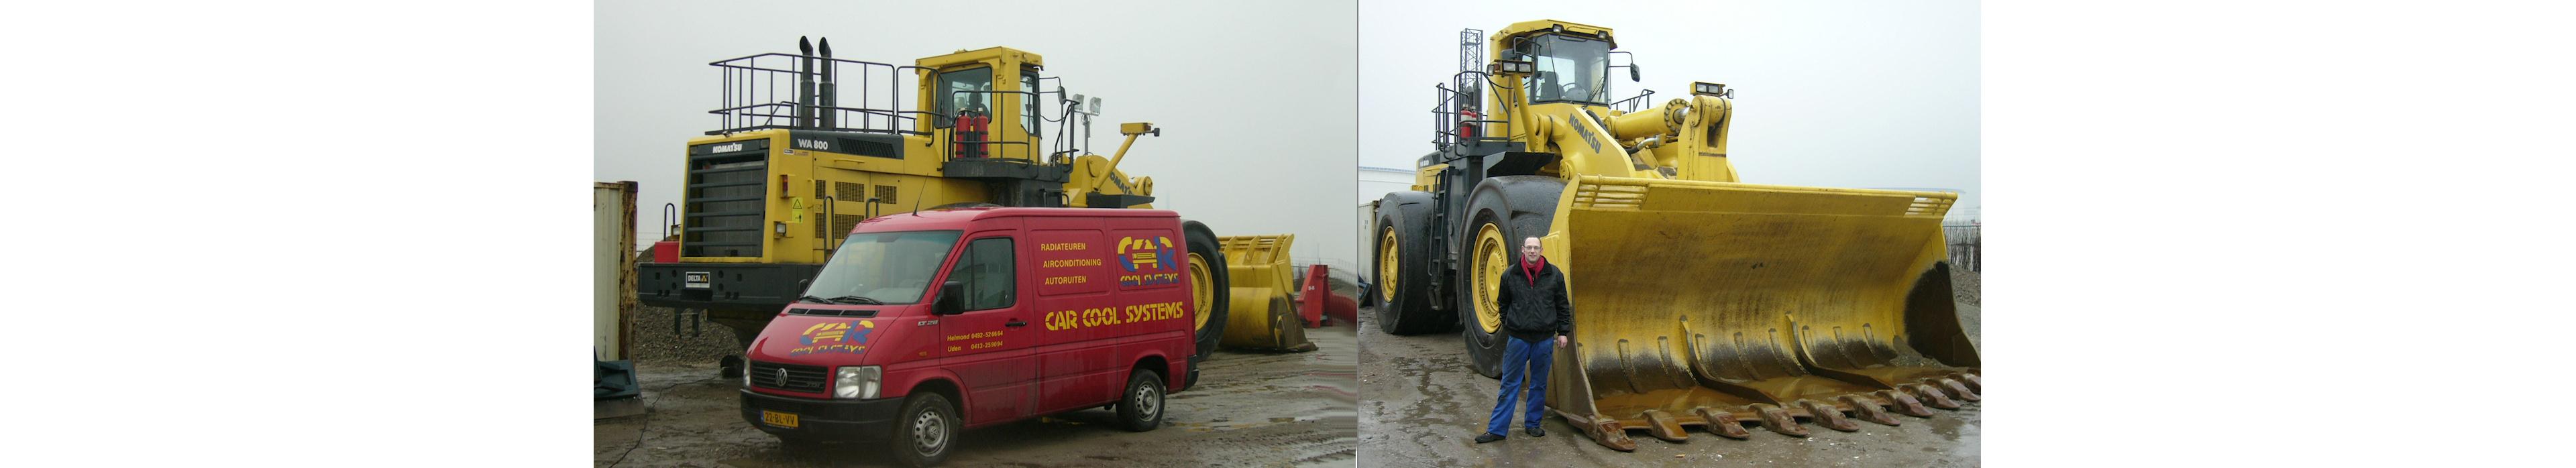 Airco service, vullen en onderhoud op locatie landbouw machine www.carcoolsystems.nl